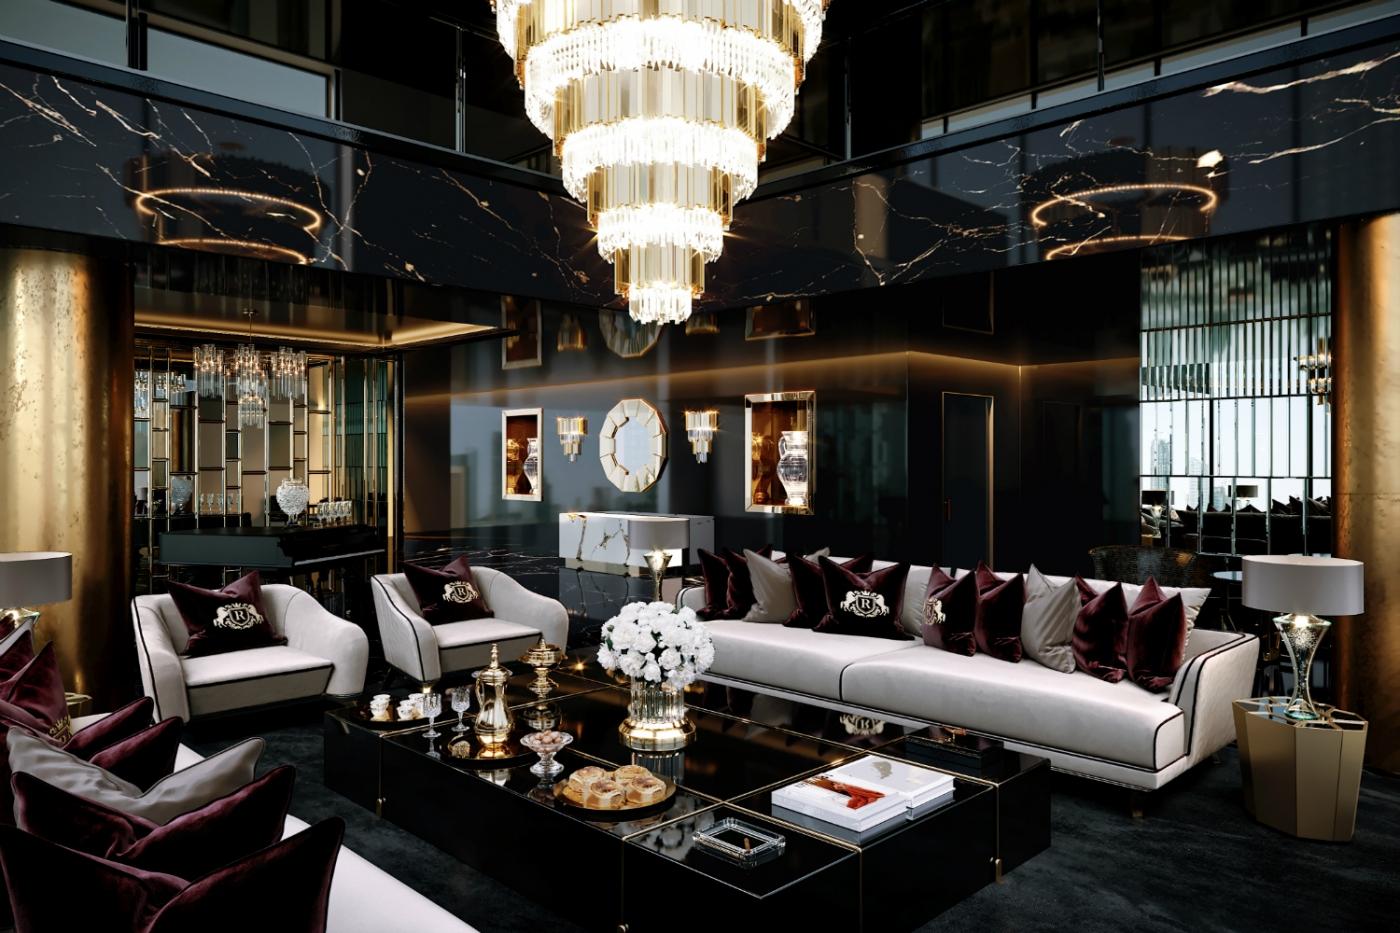 celia sawyer Opulence Meets Luxury: Inside A Glamorous Project By Celia Sawyer featuredinspiration 1400x933